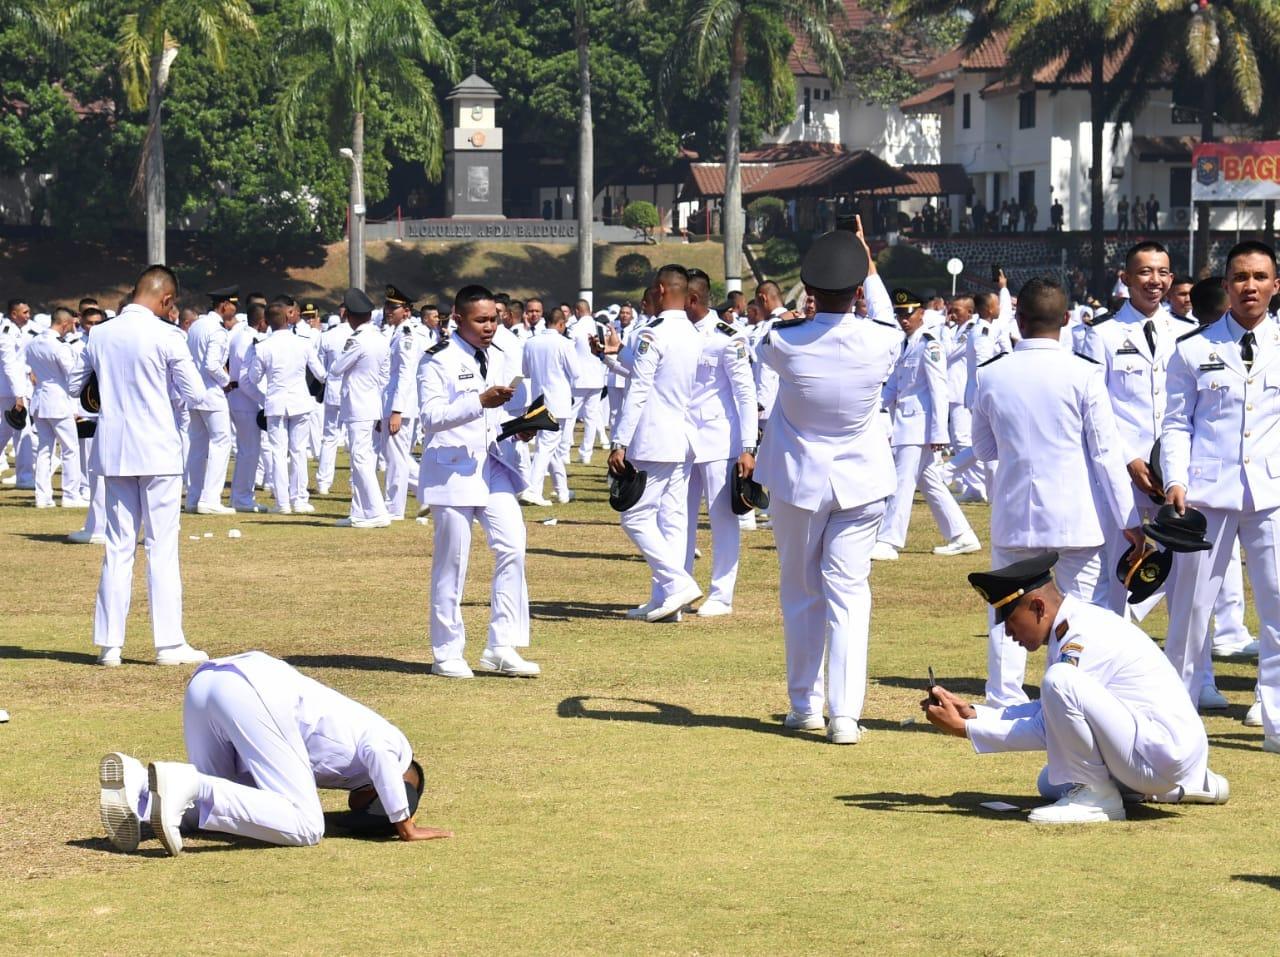 presiden-jadilah-pamong-praja-yang-mengantarkan-kemajuan-dan-kejayaan-indonesia-27